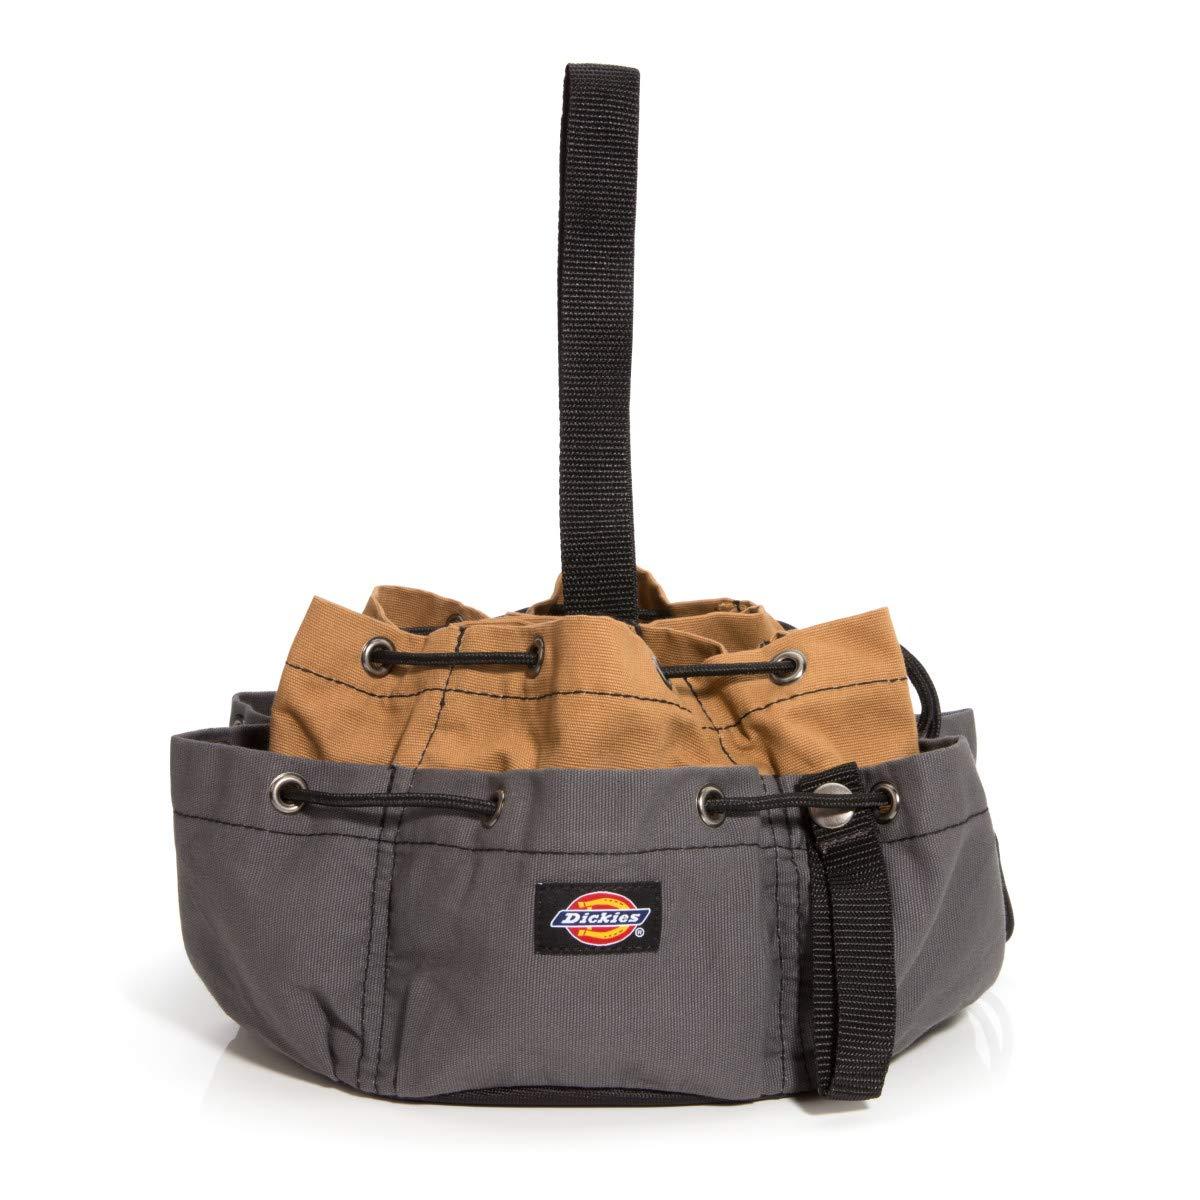 Dickies Work Gear – 12-Pocket Parachute Style Bag – 57004 – Grey/Tan Parachute Work Bag – Tool Bag – Construction – Snap-Secured Tape Strap – 8.8 oz.